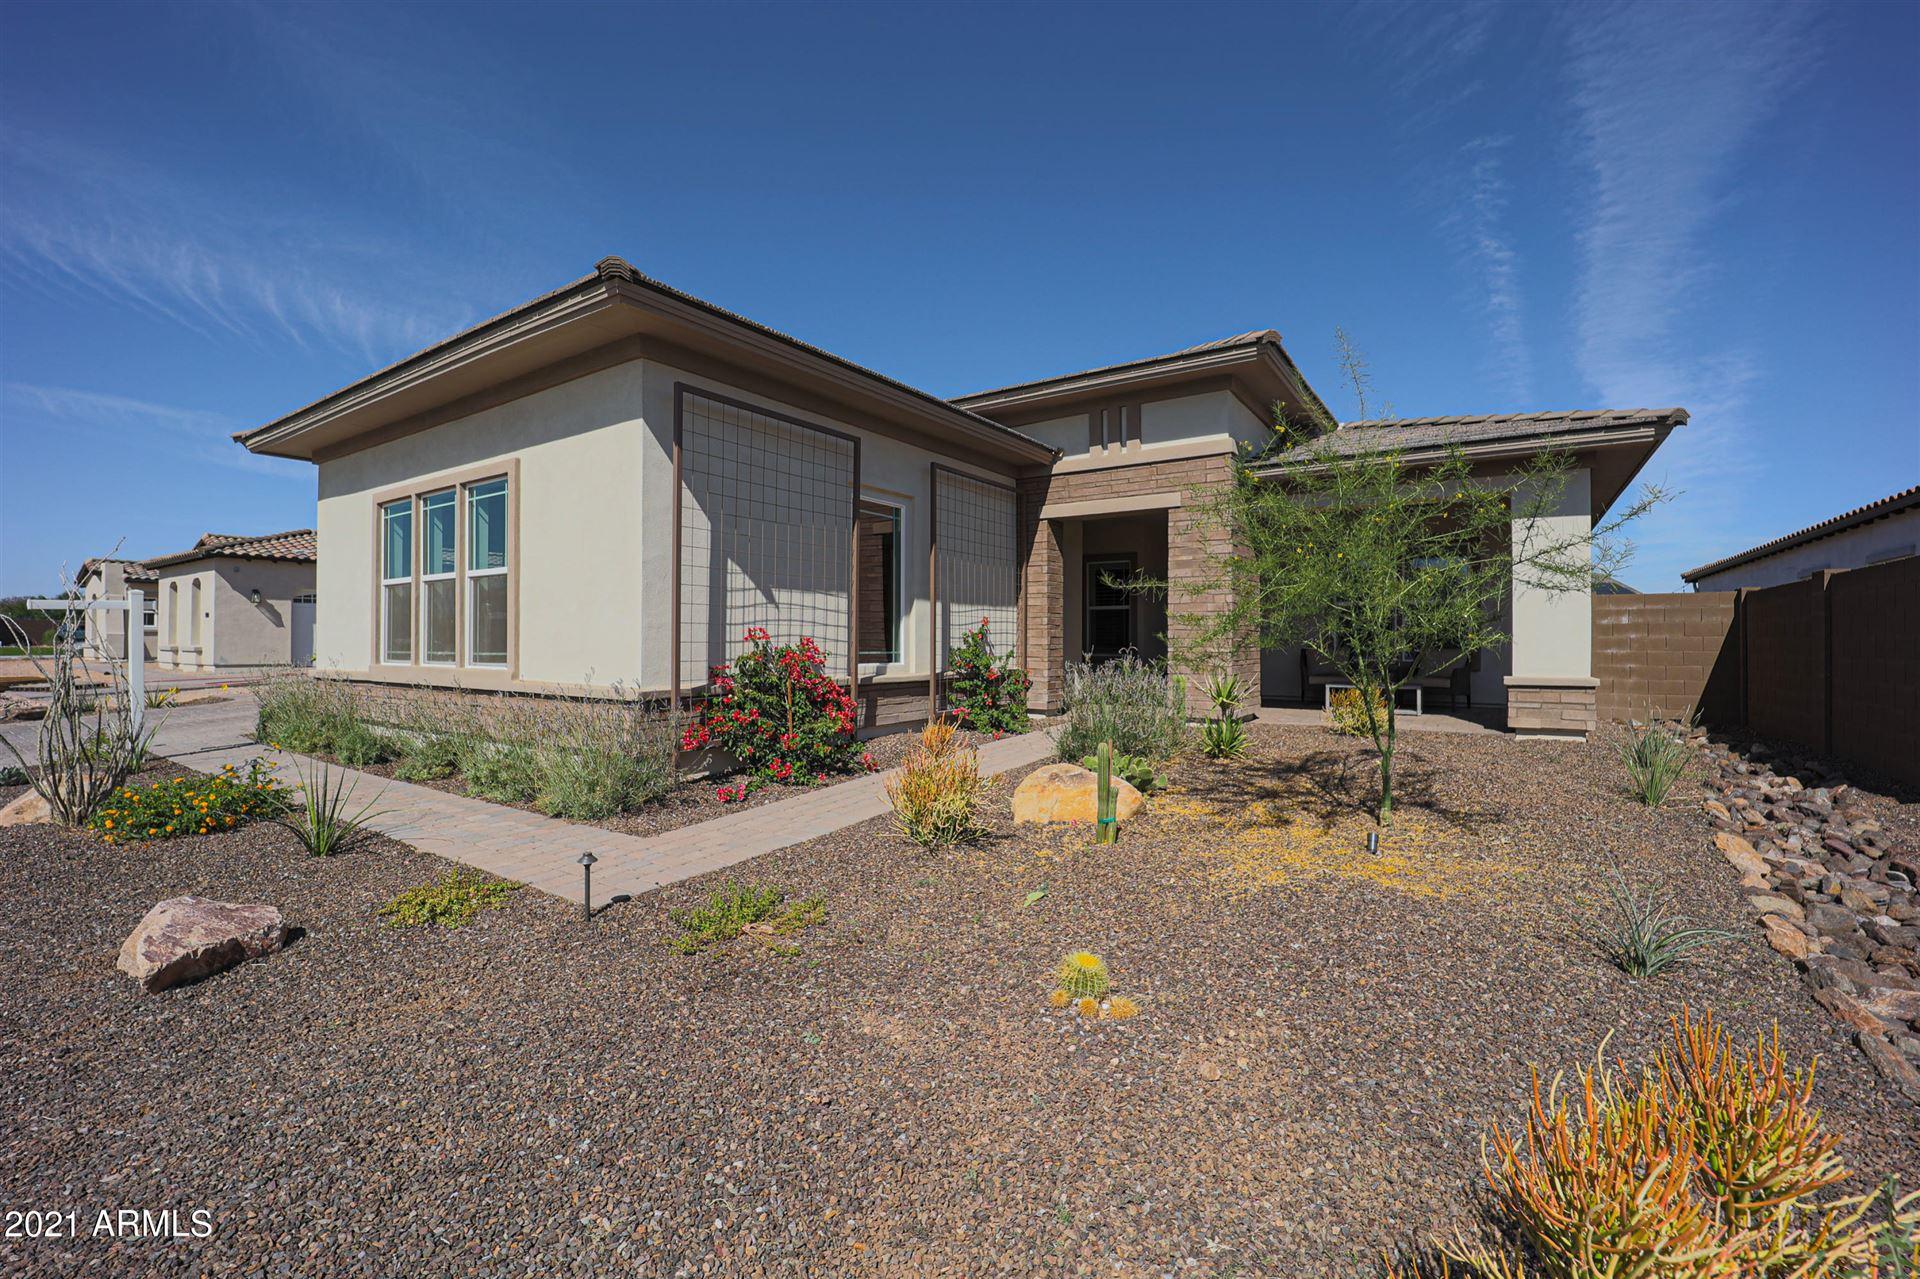 Photo of 23285 N 97TH Drive, Peoria, AZ 85383 (MLS # 6231163)